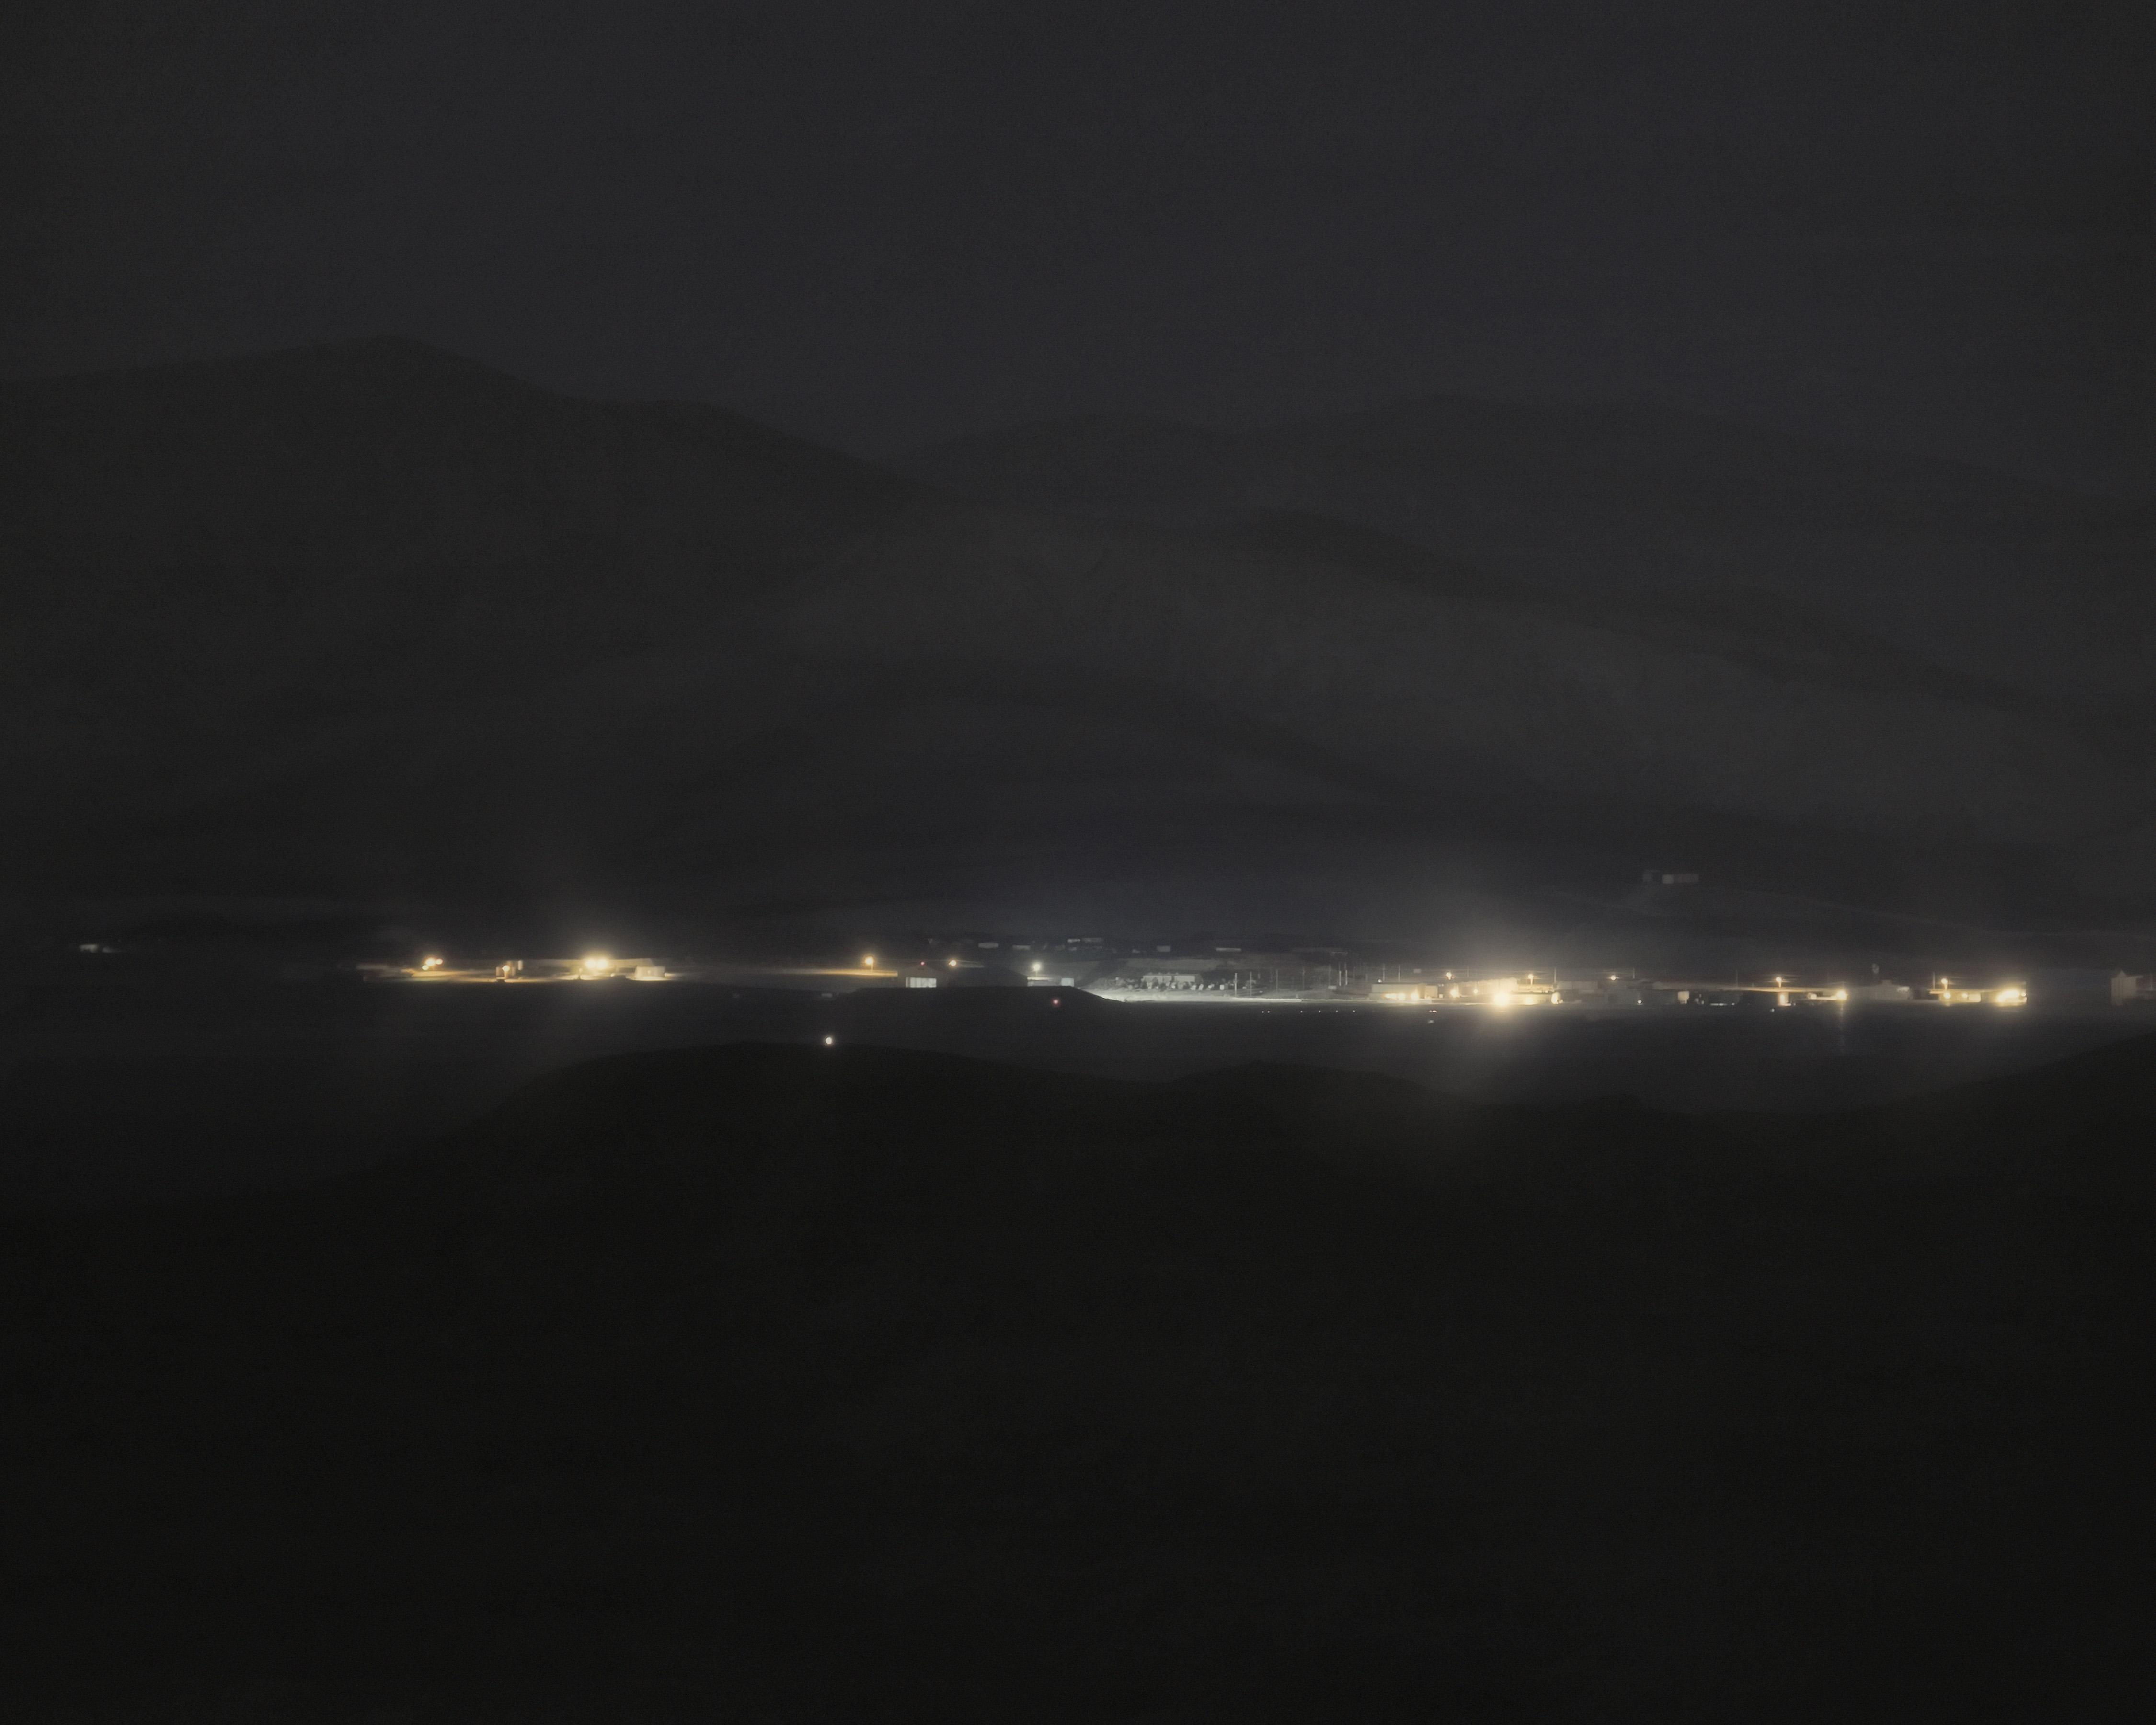 Detachment 3, Air Force Flight Test Center #2; Groom Lake, NV; Distance ~ 26 Miles, 2008